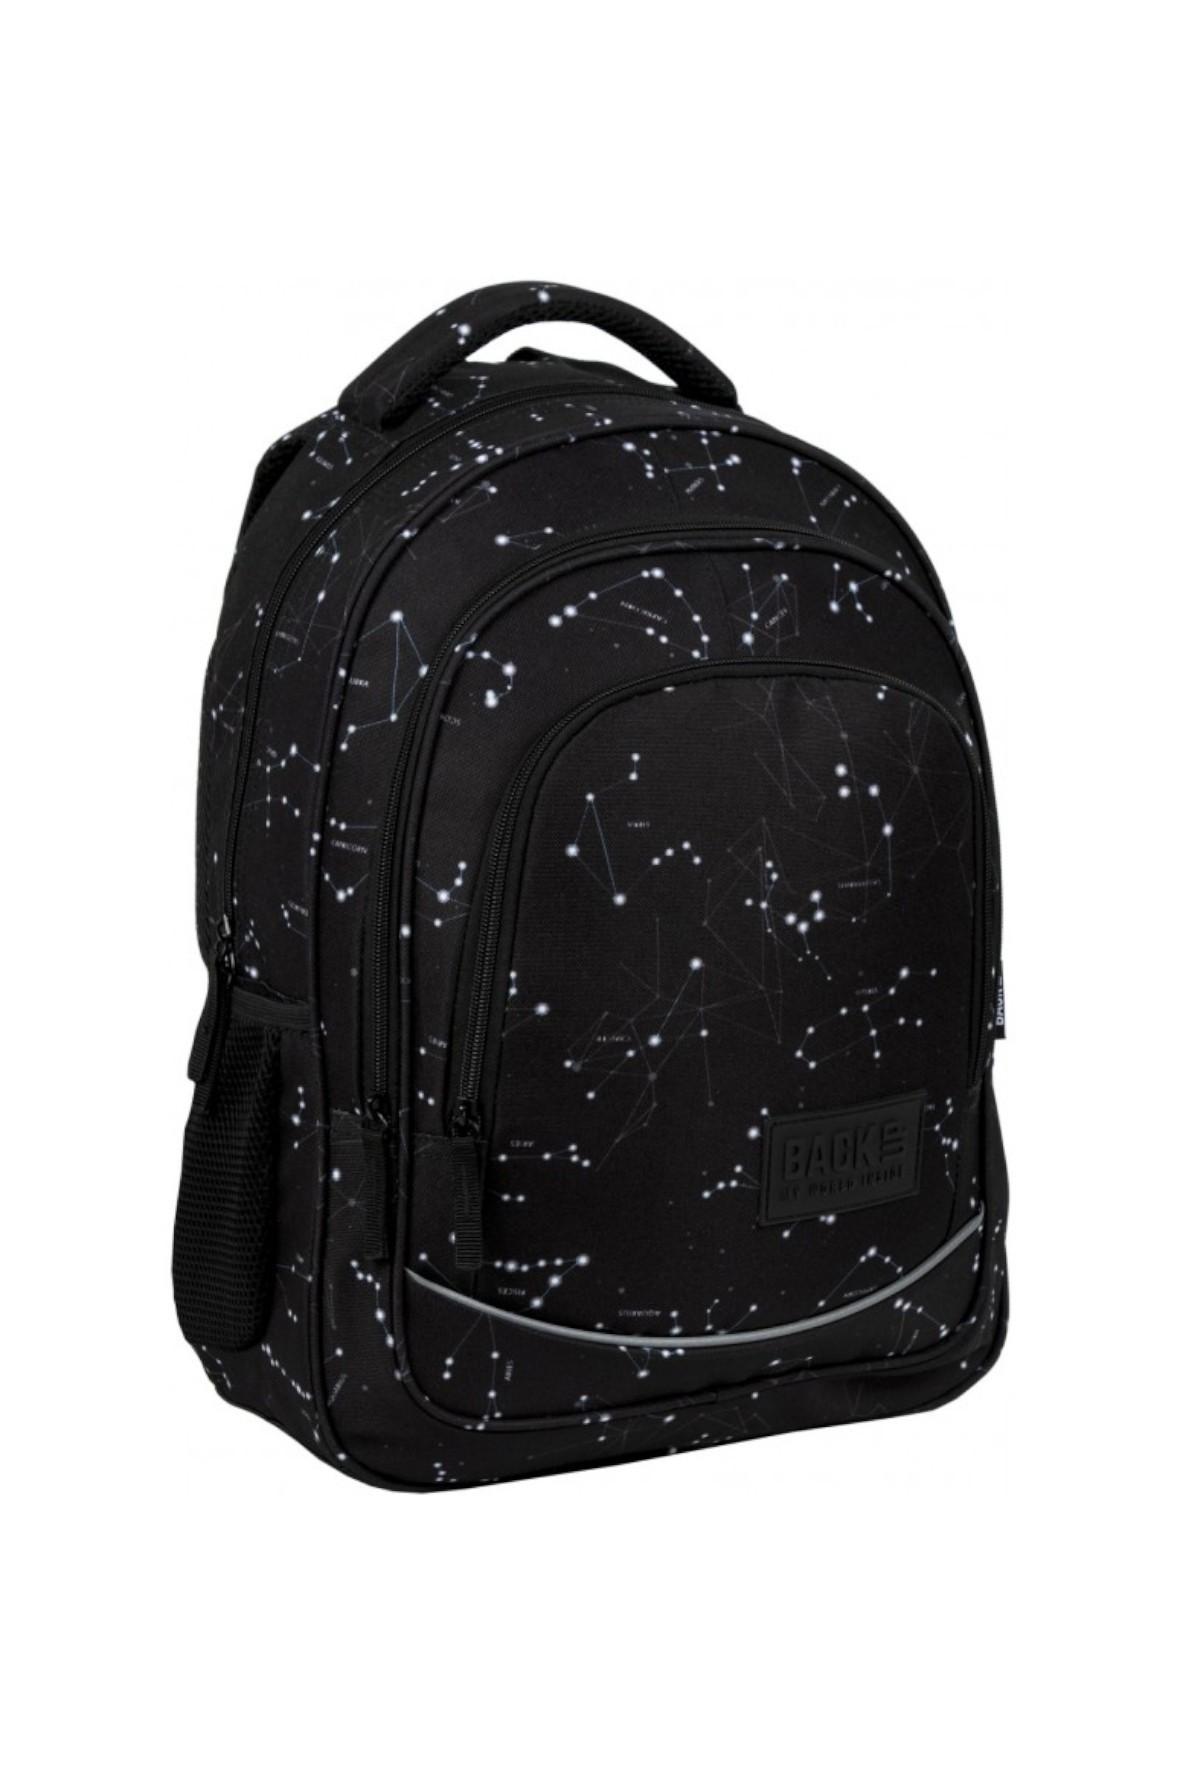 Plecak dla chłopca BackUp Konstelacje